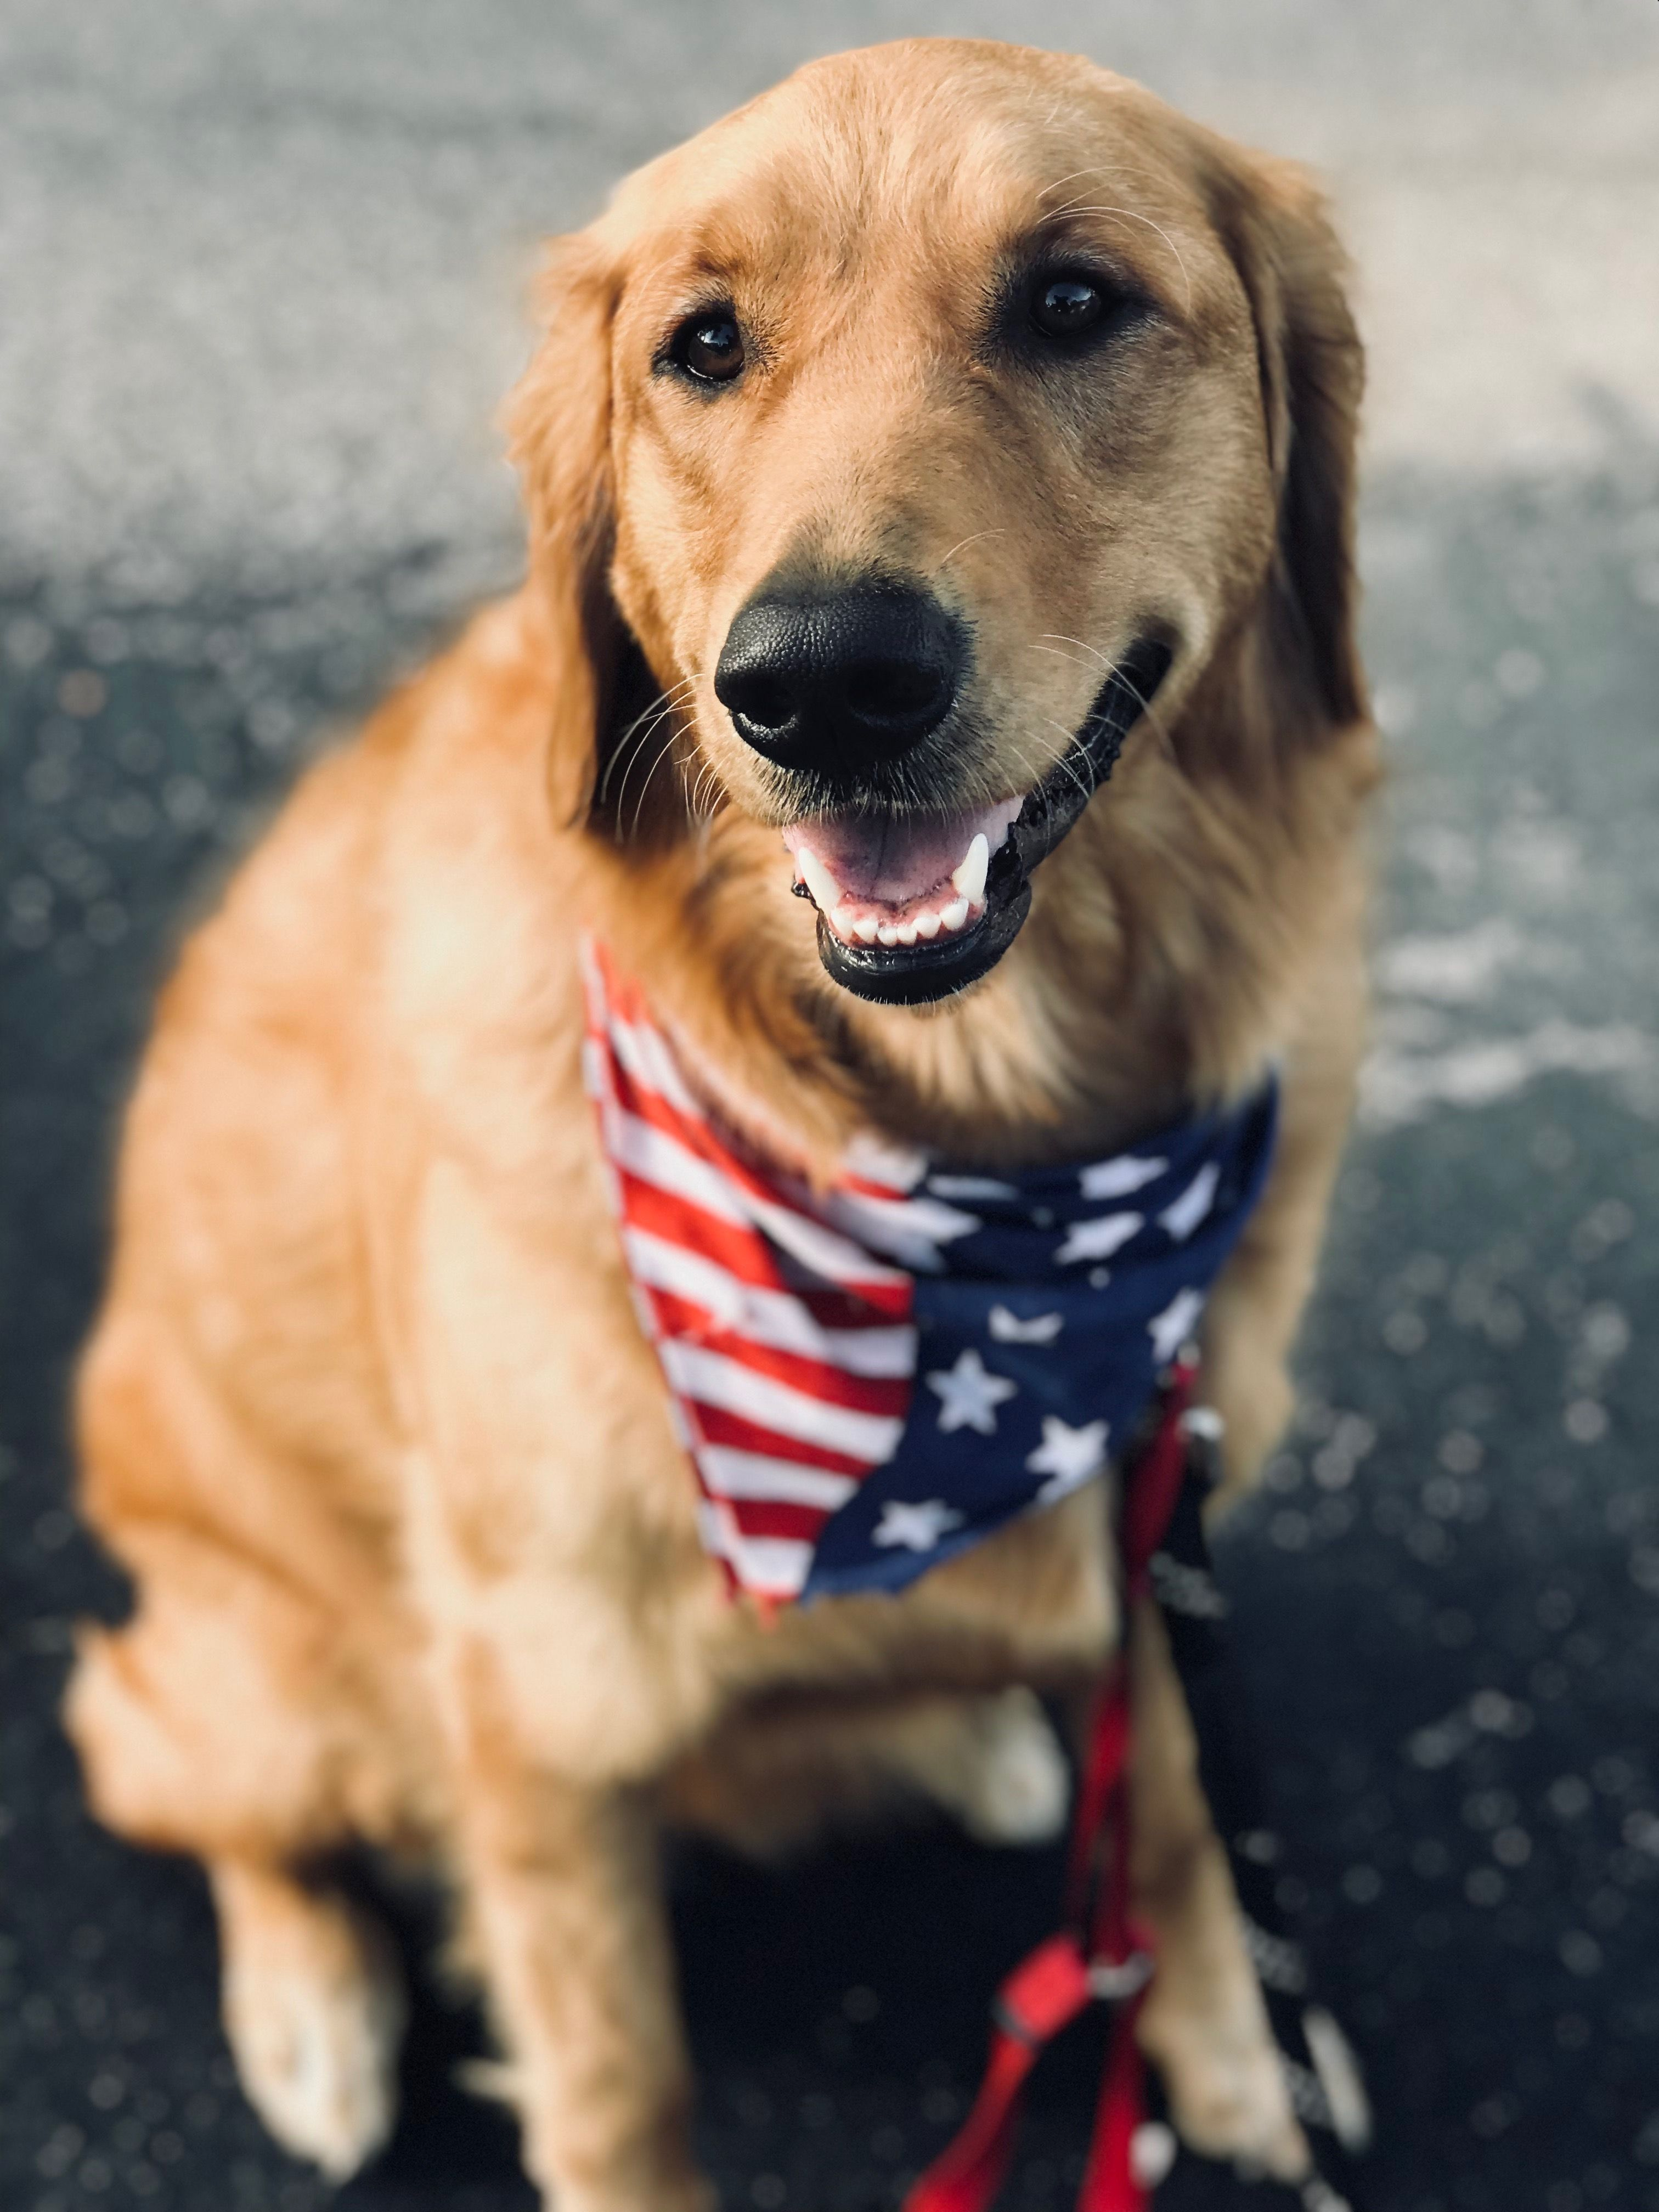 Golden retriever, Fourth of July, dogs, puppy, golden